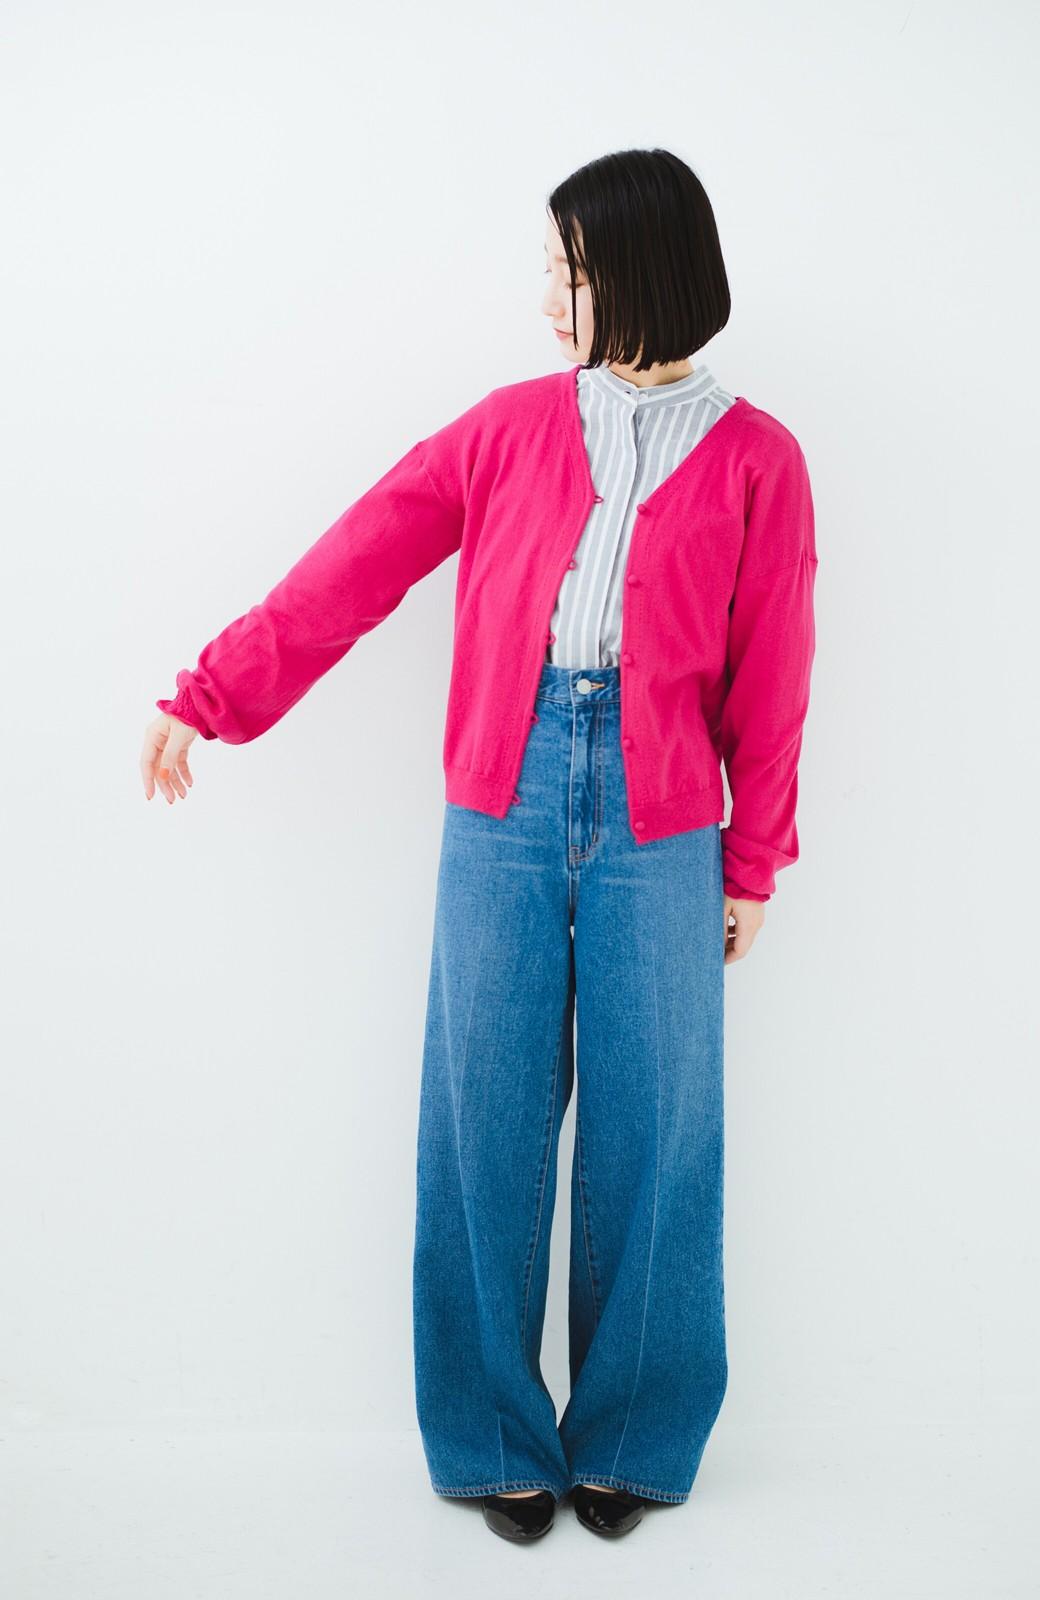 haco! 我らが天敵紫外線!UVカット加工の袖シャーリングニットカーディガン <ピンク>の商品写真6